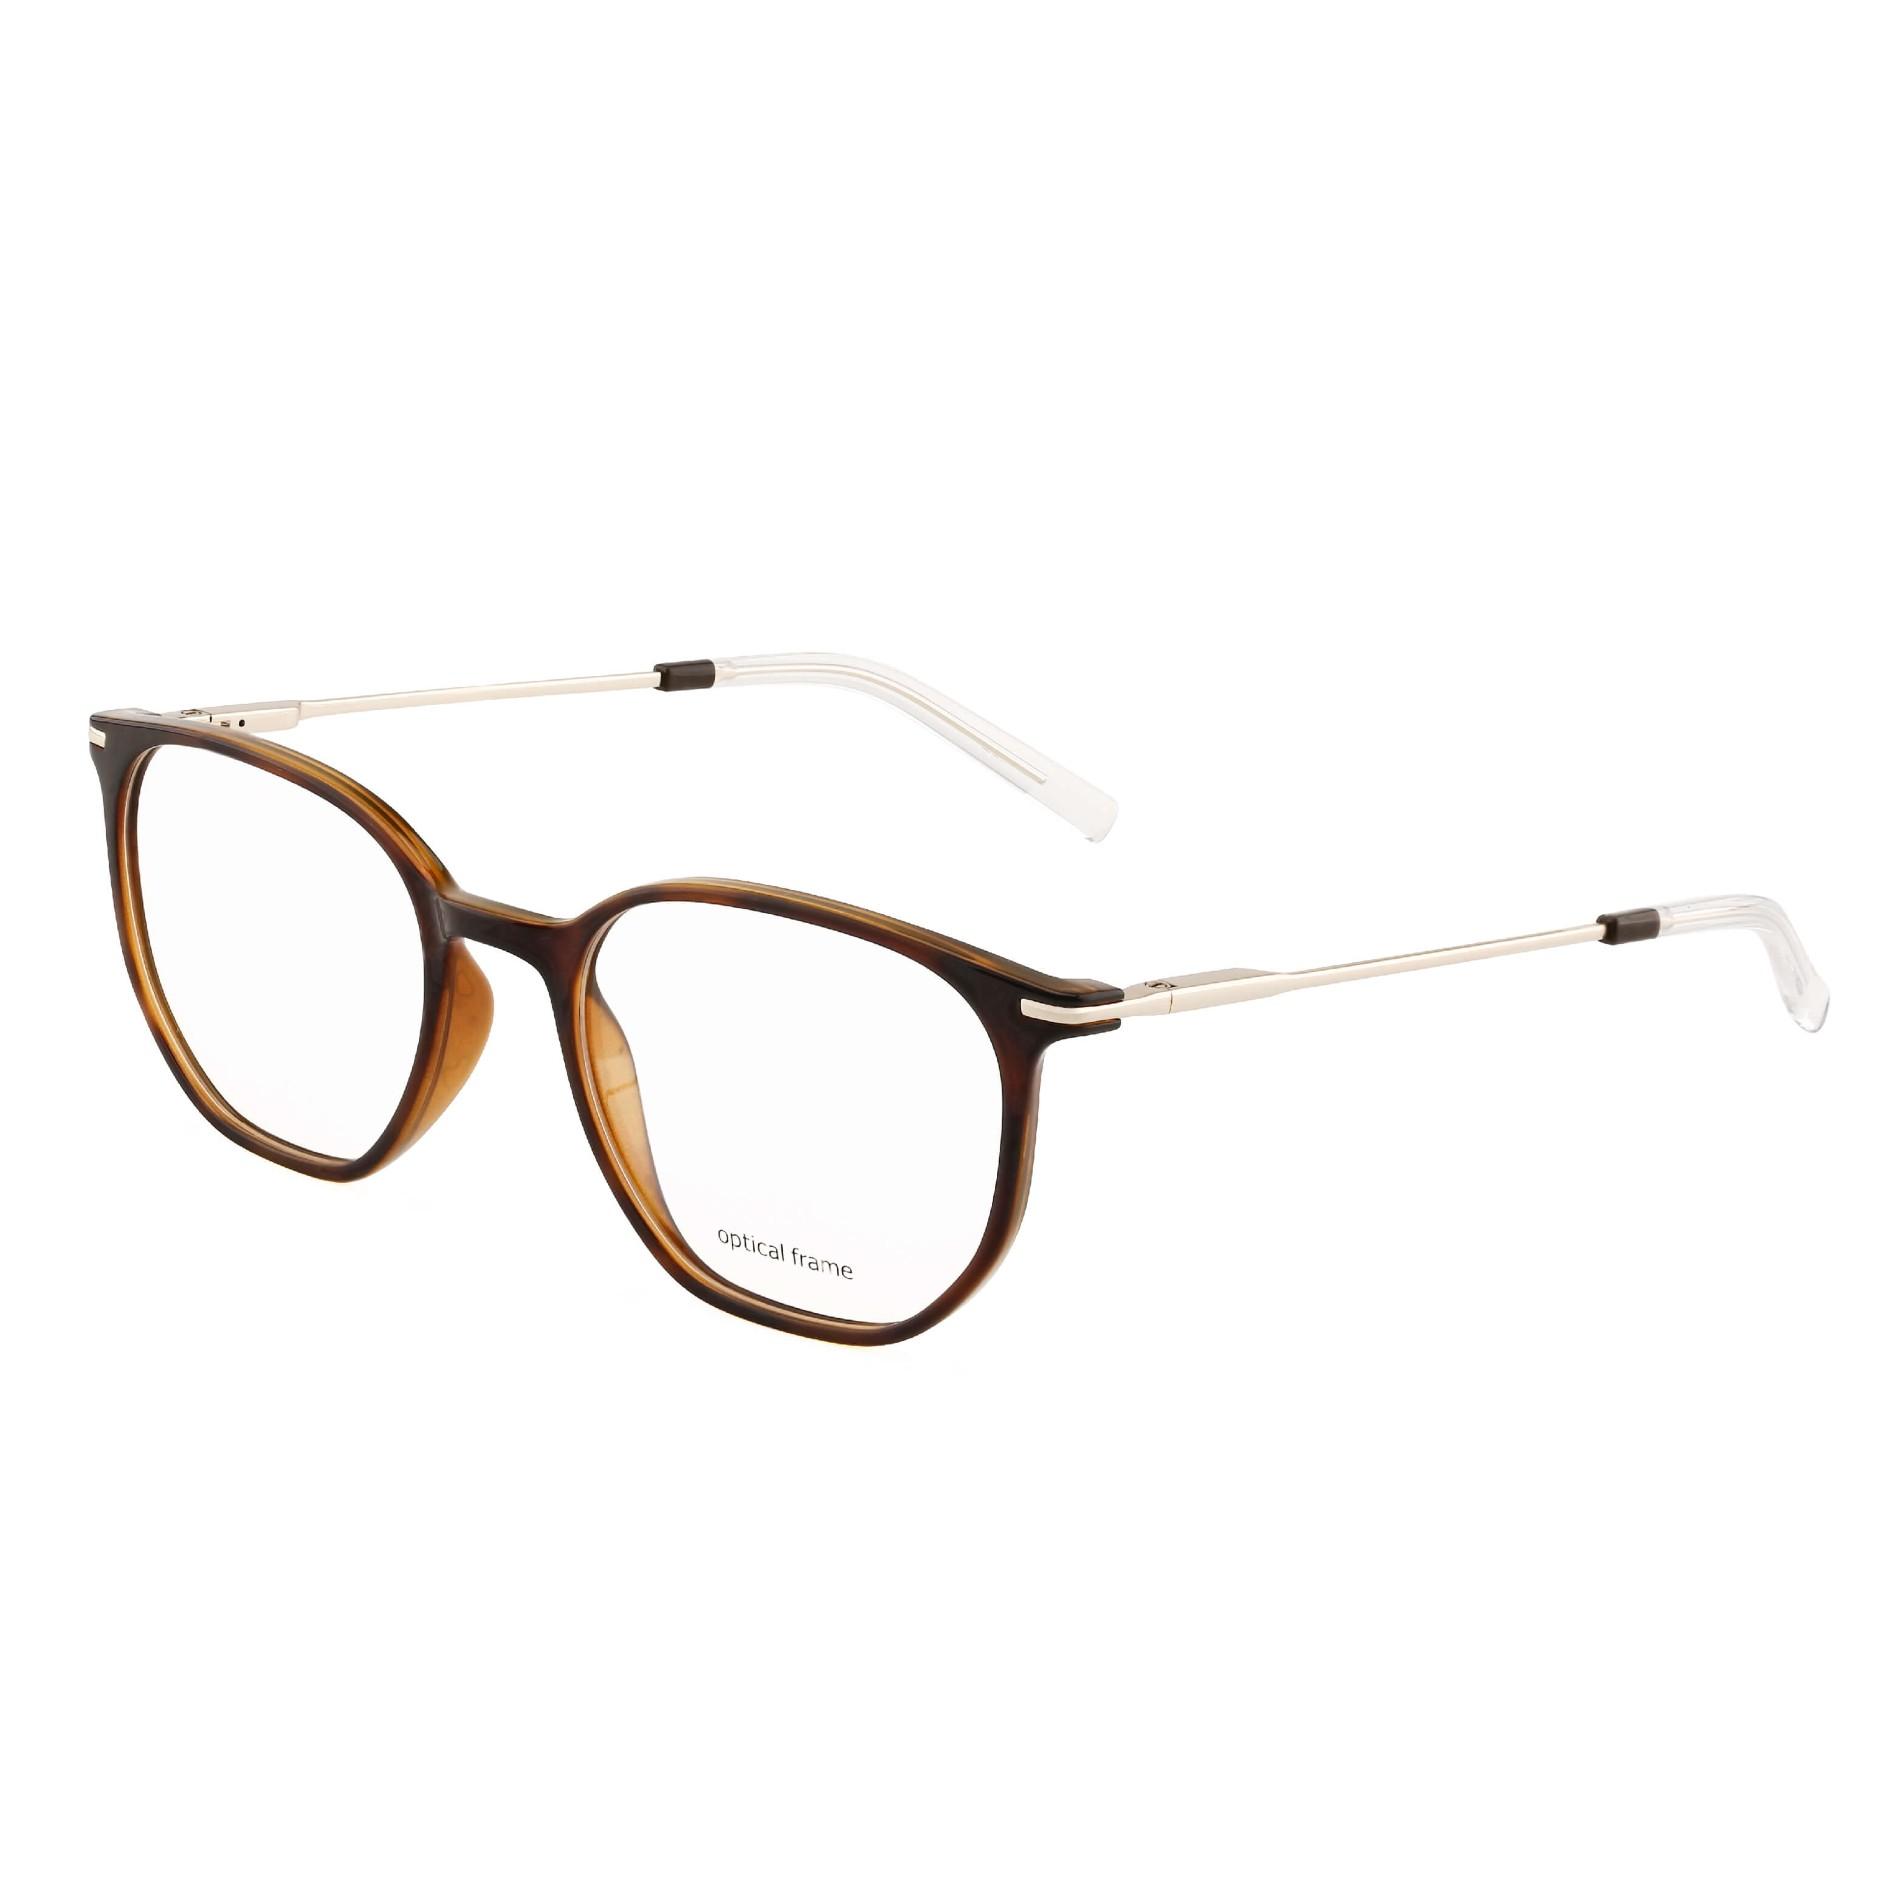 Metal Temple and TR90 Glasses Frames Blue Light Blocking Glasses